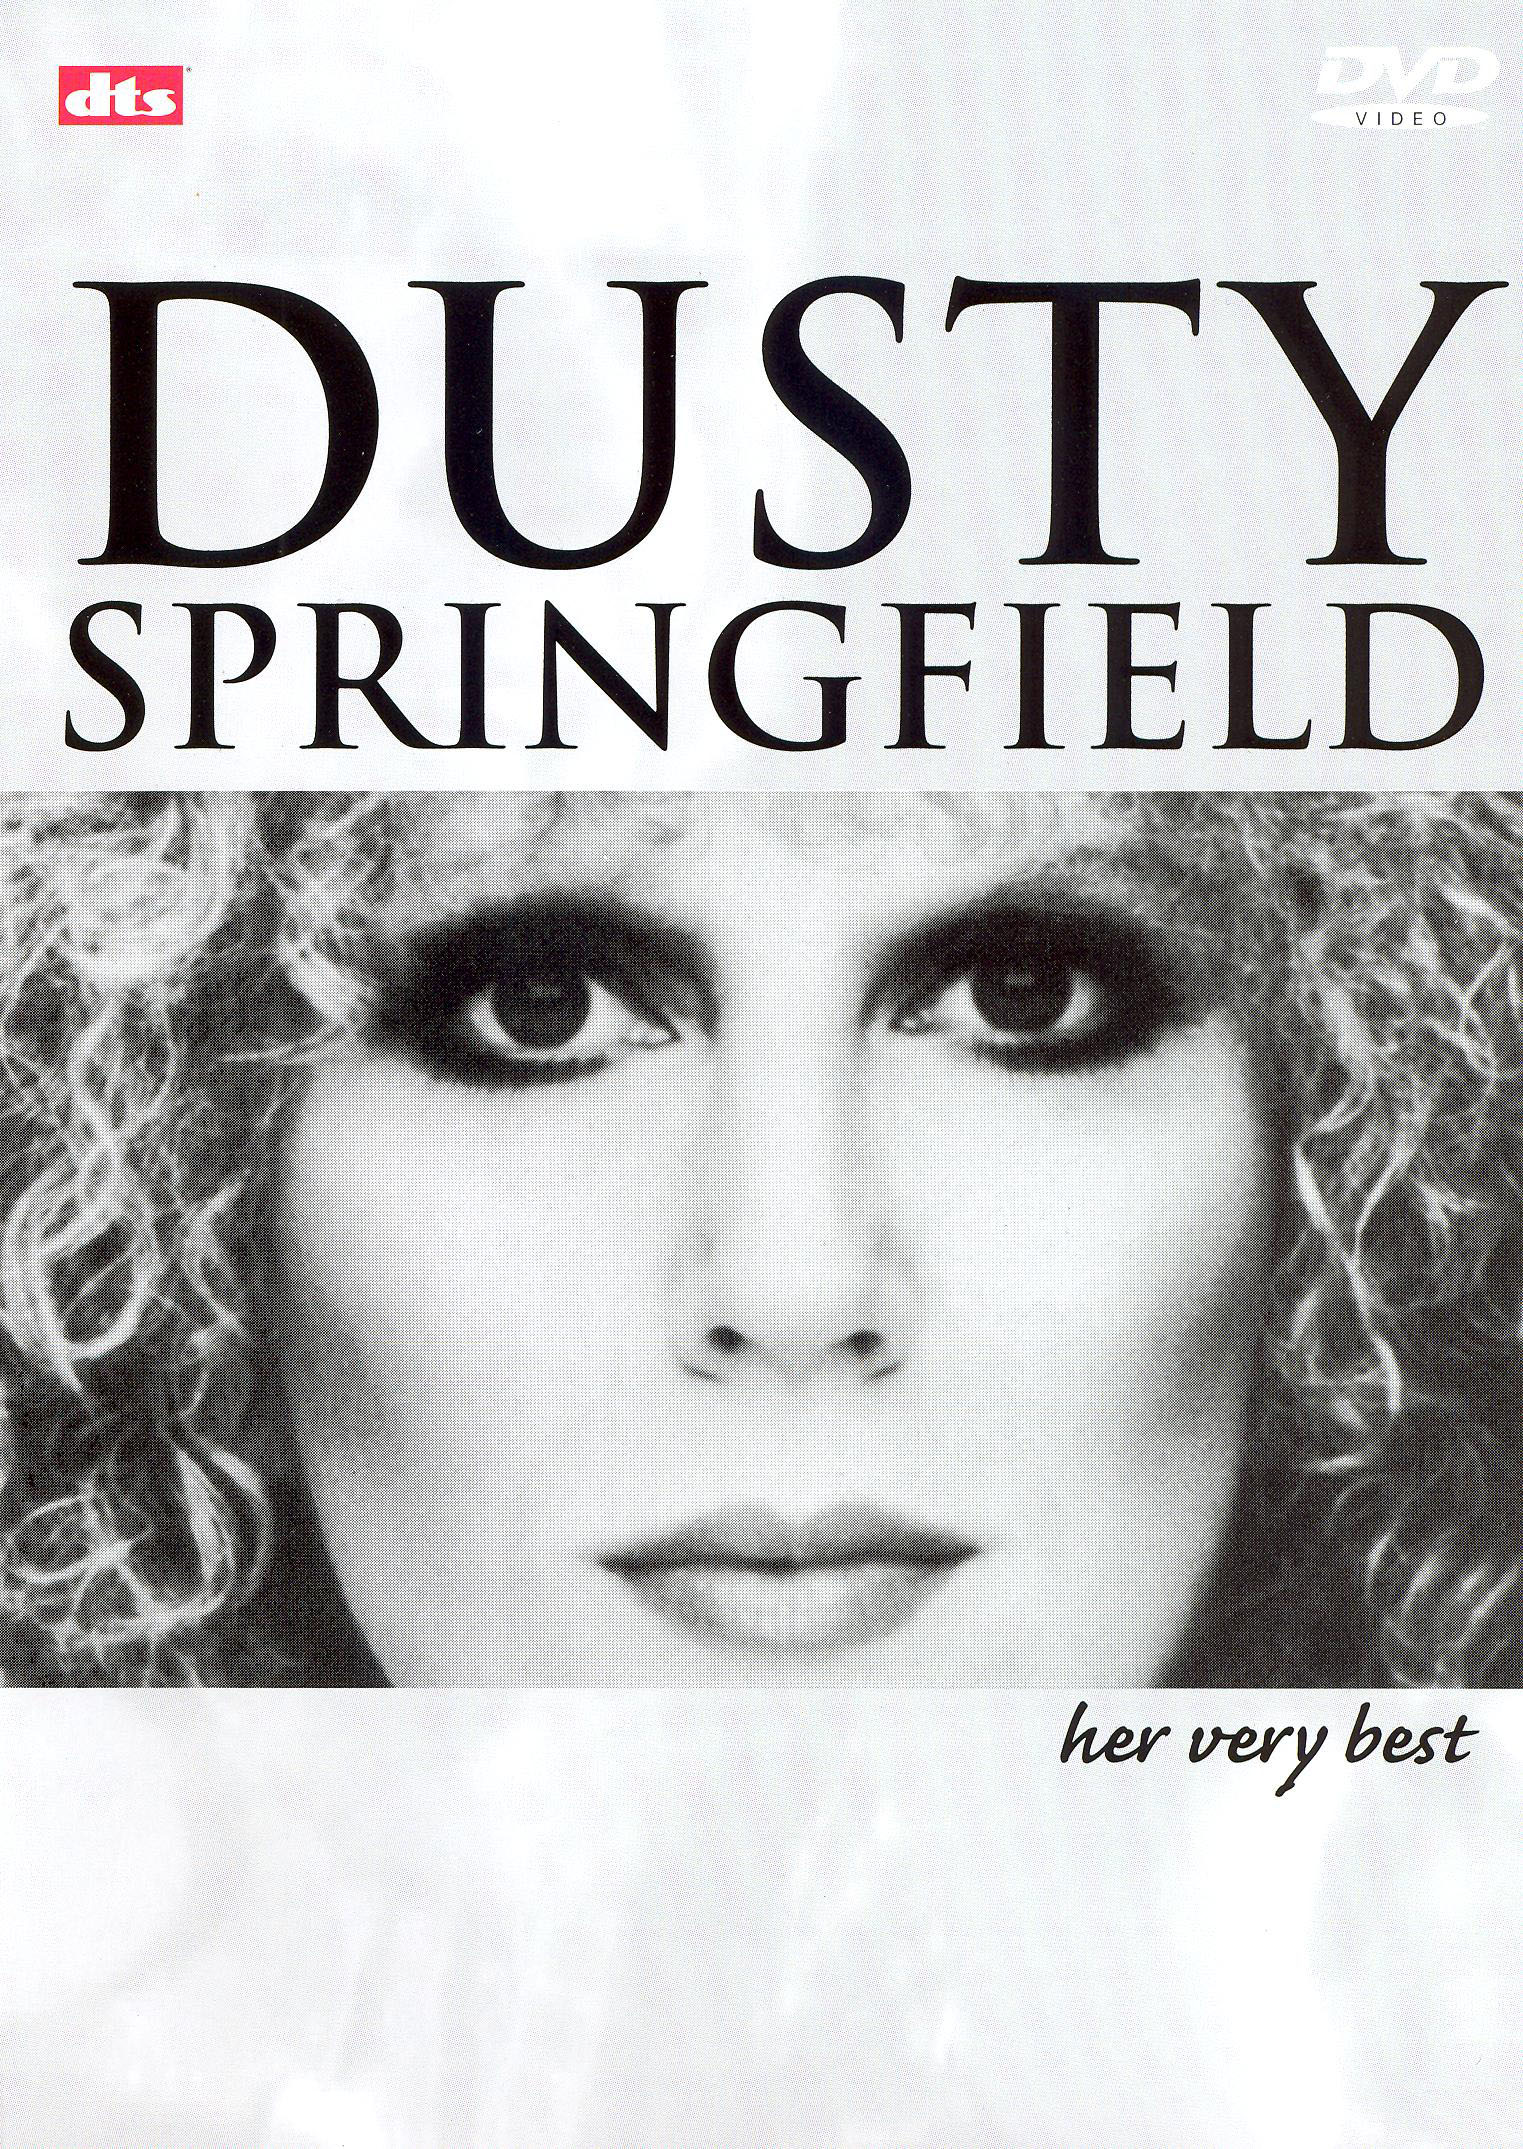 Dusty Springfield: Her Very Best